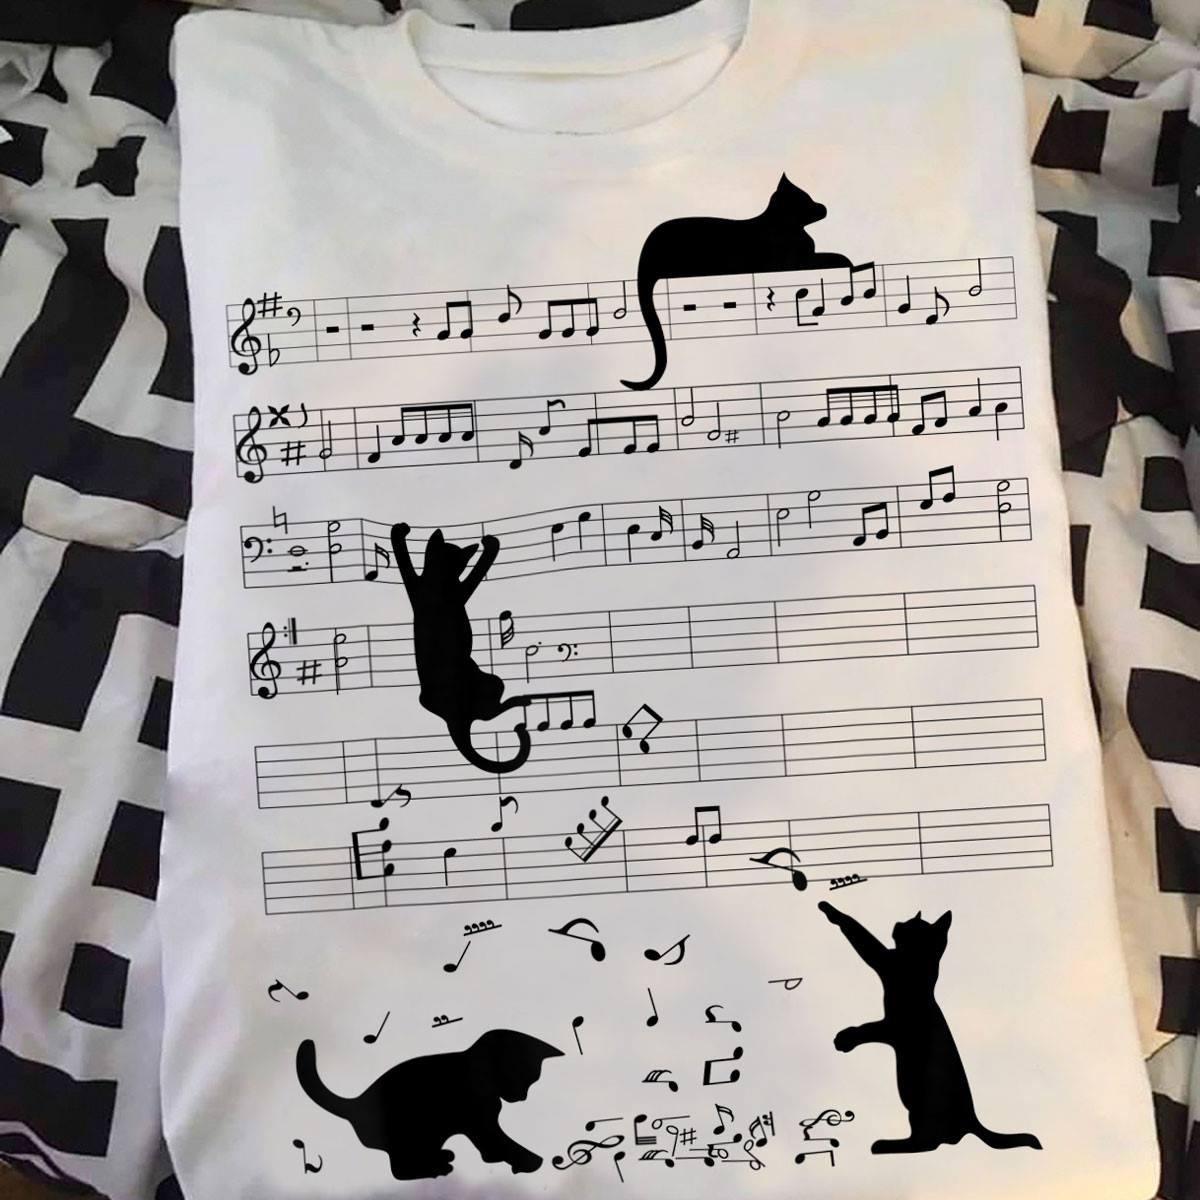 Funny Cat Shirt Black Cat Climbing Music Sheet